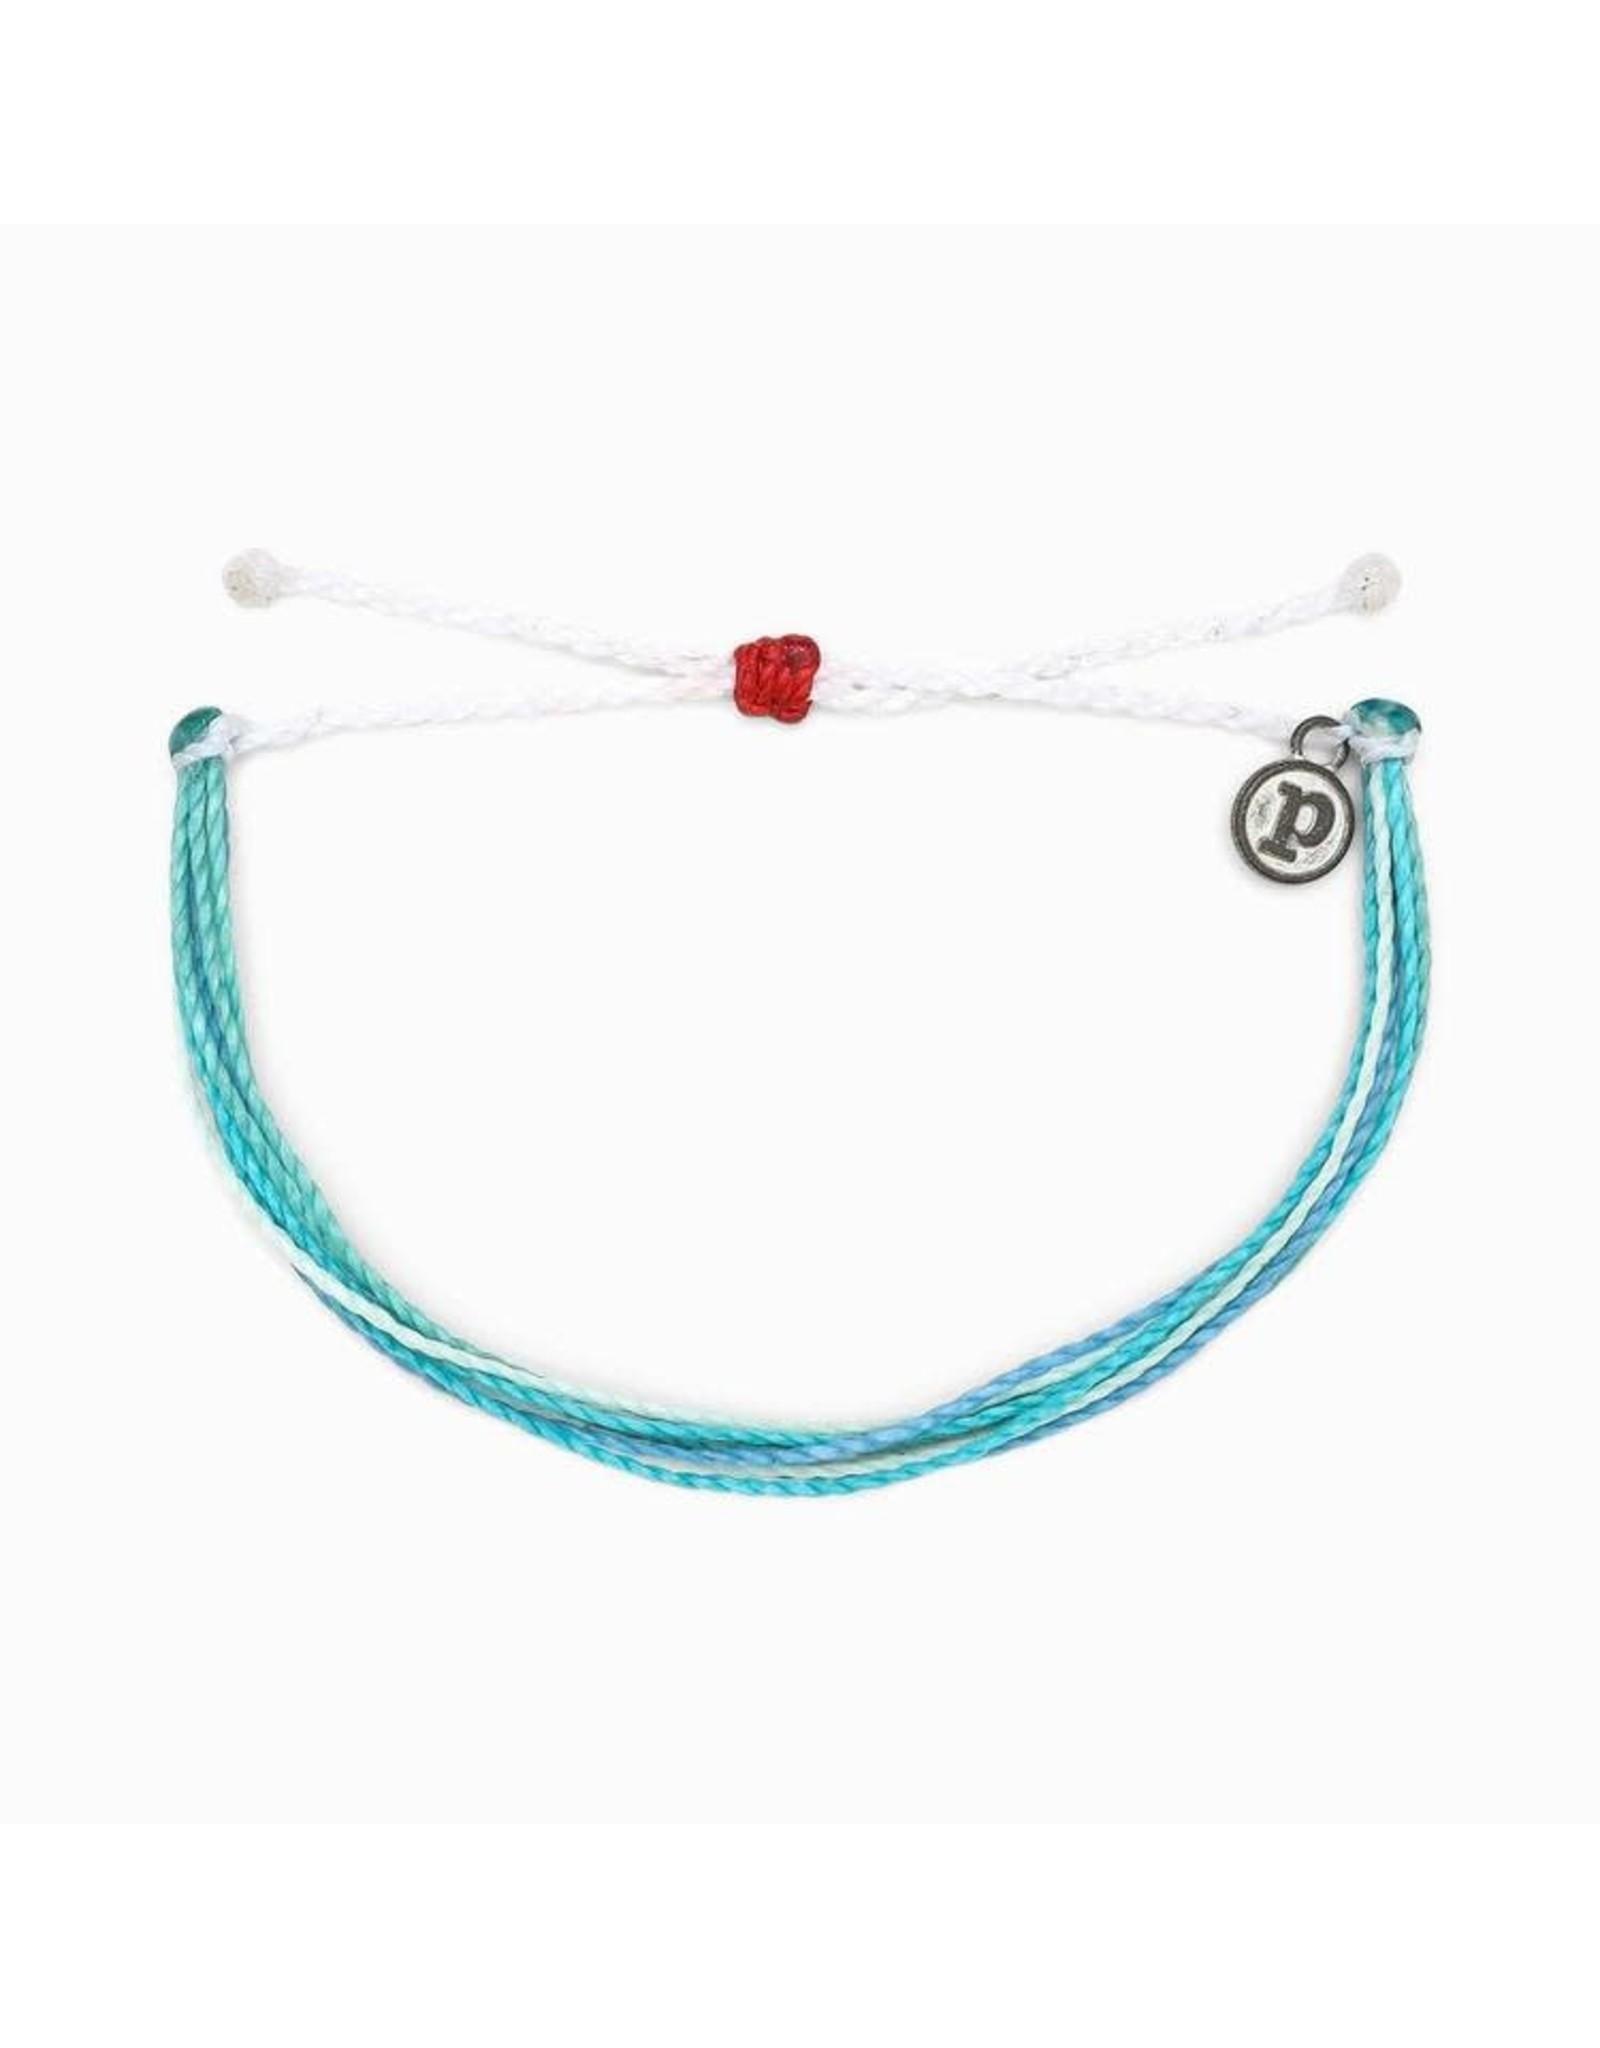 Puravida Bracelets Charity Original For Oceans